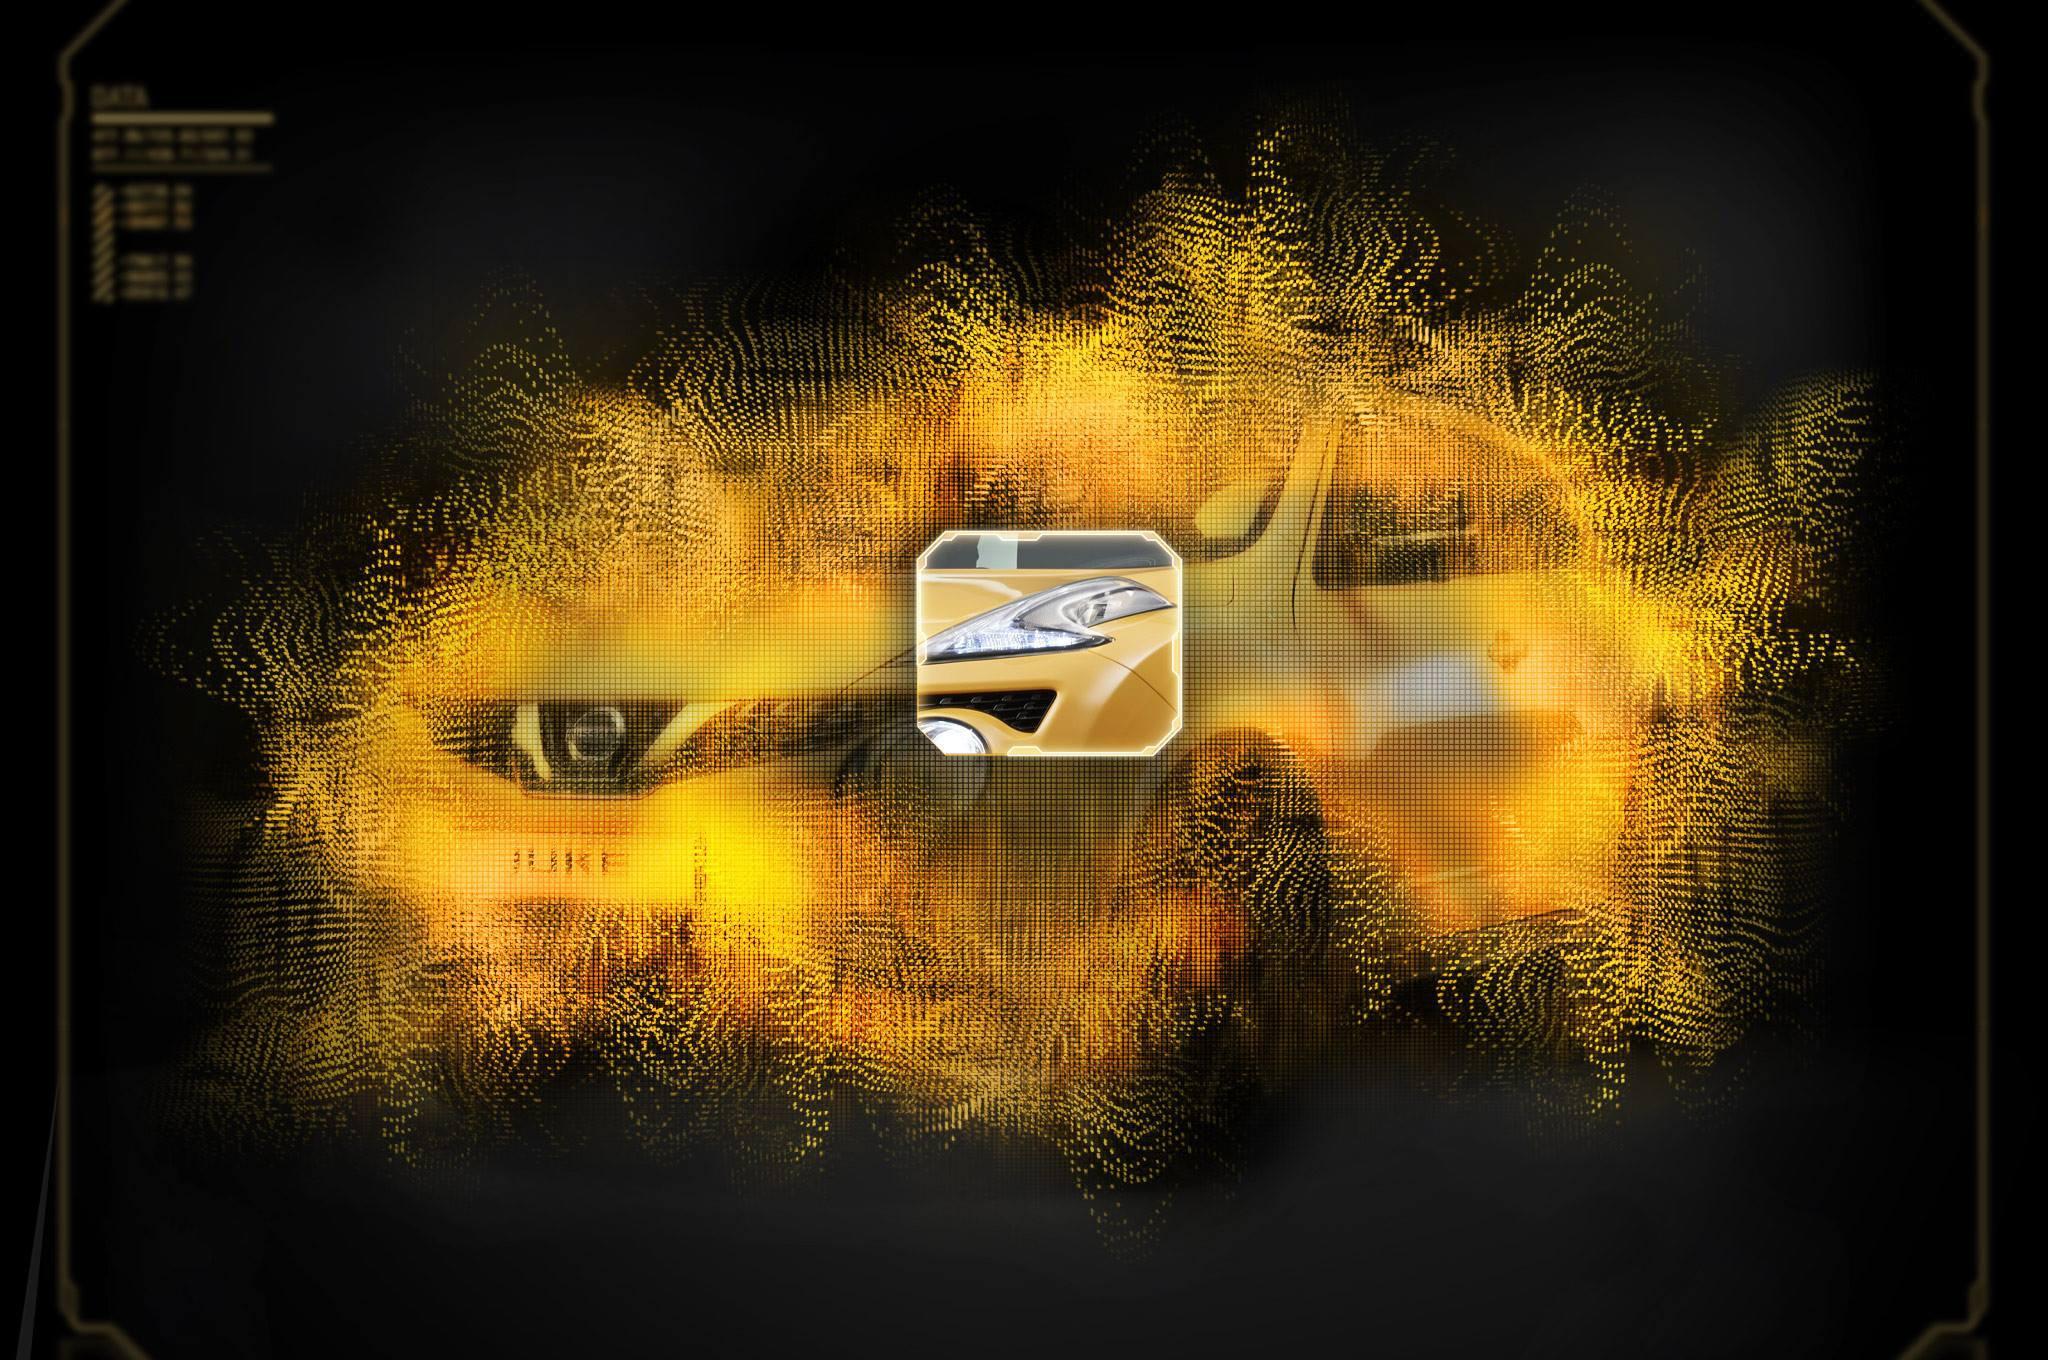 2015 Nissan Juke Teaser Turn Signals1